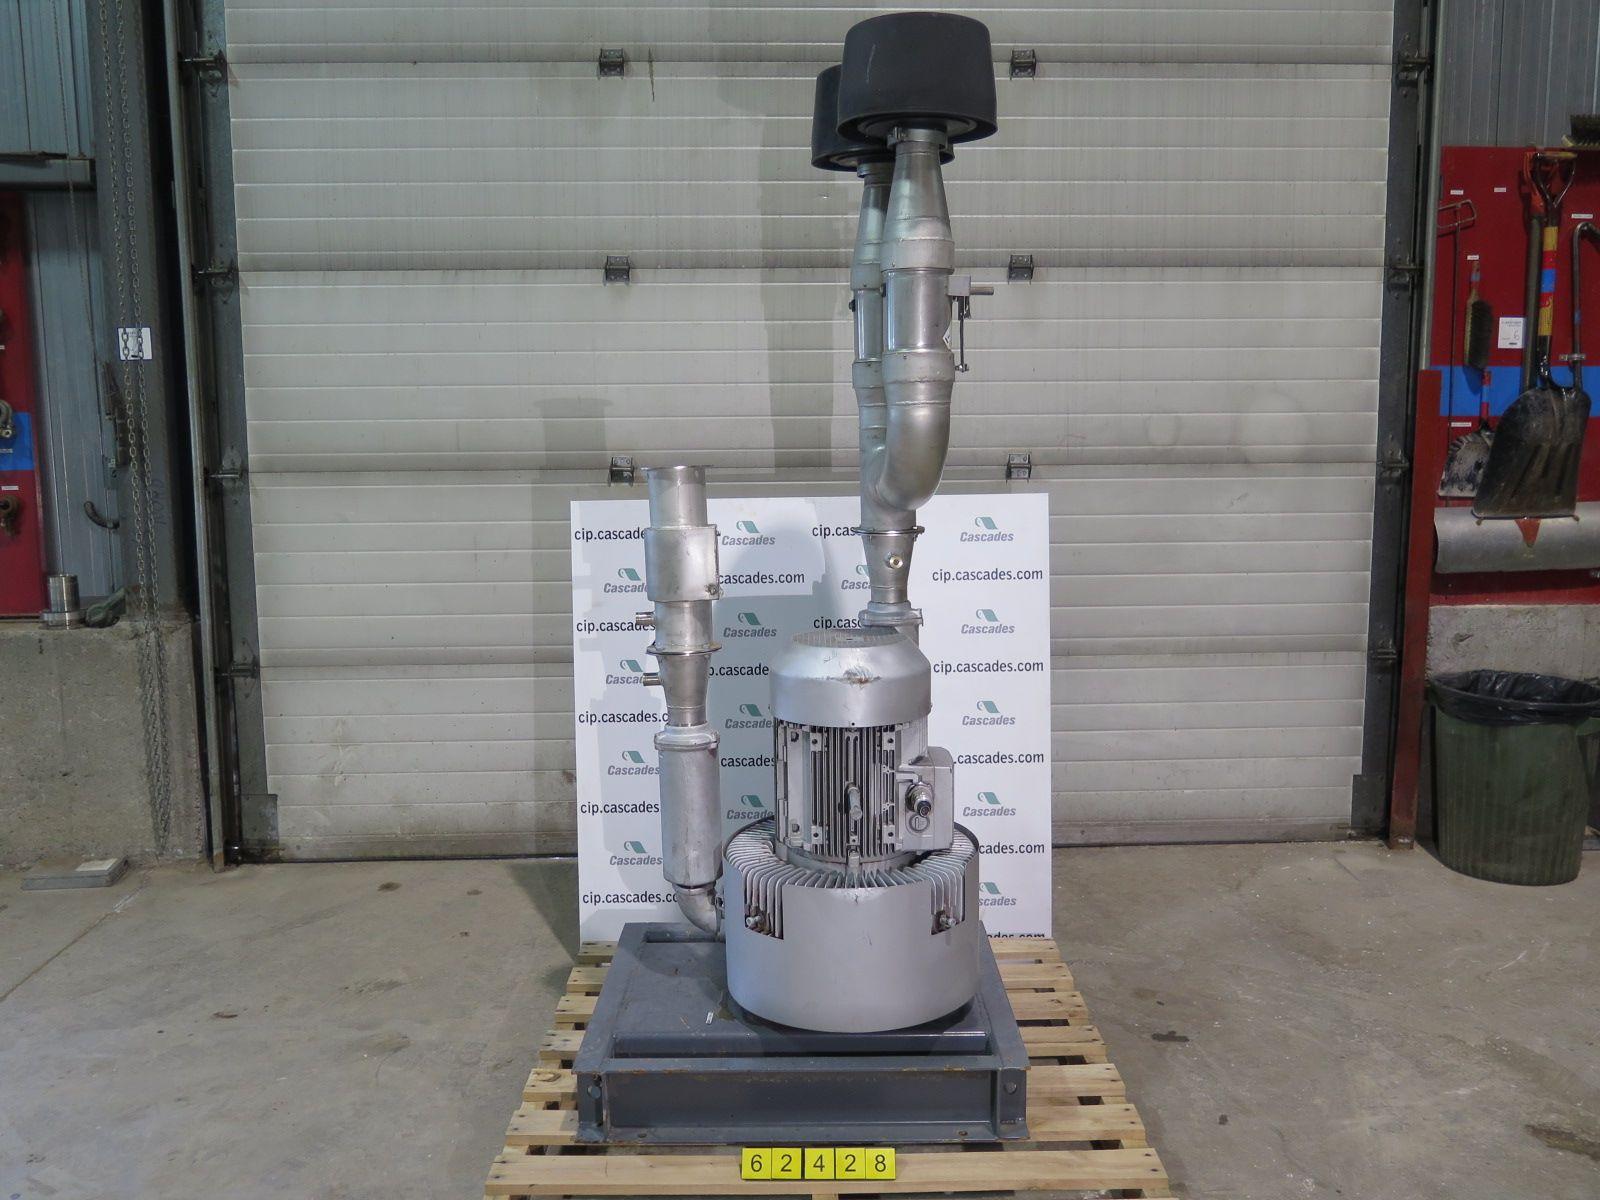 hight resolution of side chanel blower gardner denver g serie type 2bh1 810 model 2bh1810 7hc45